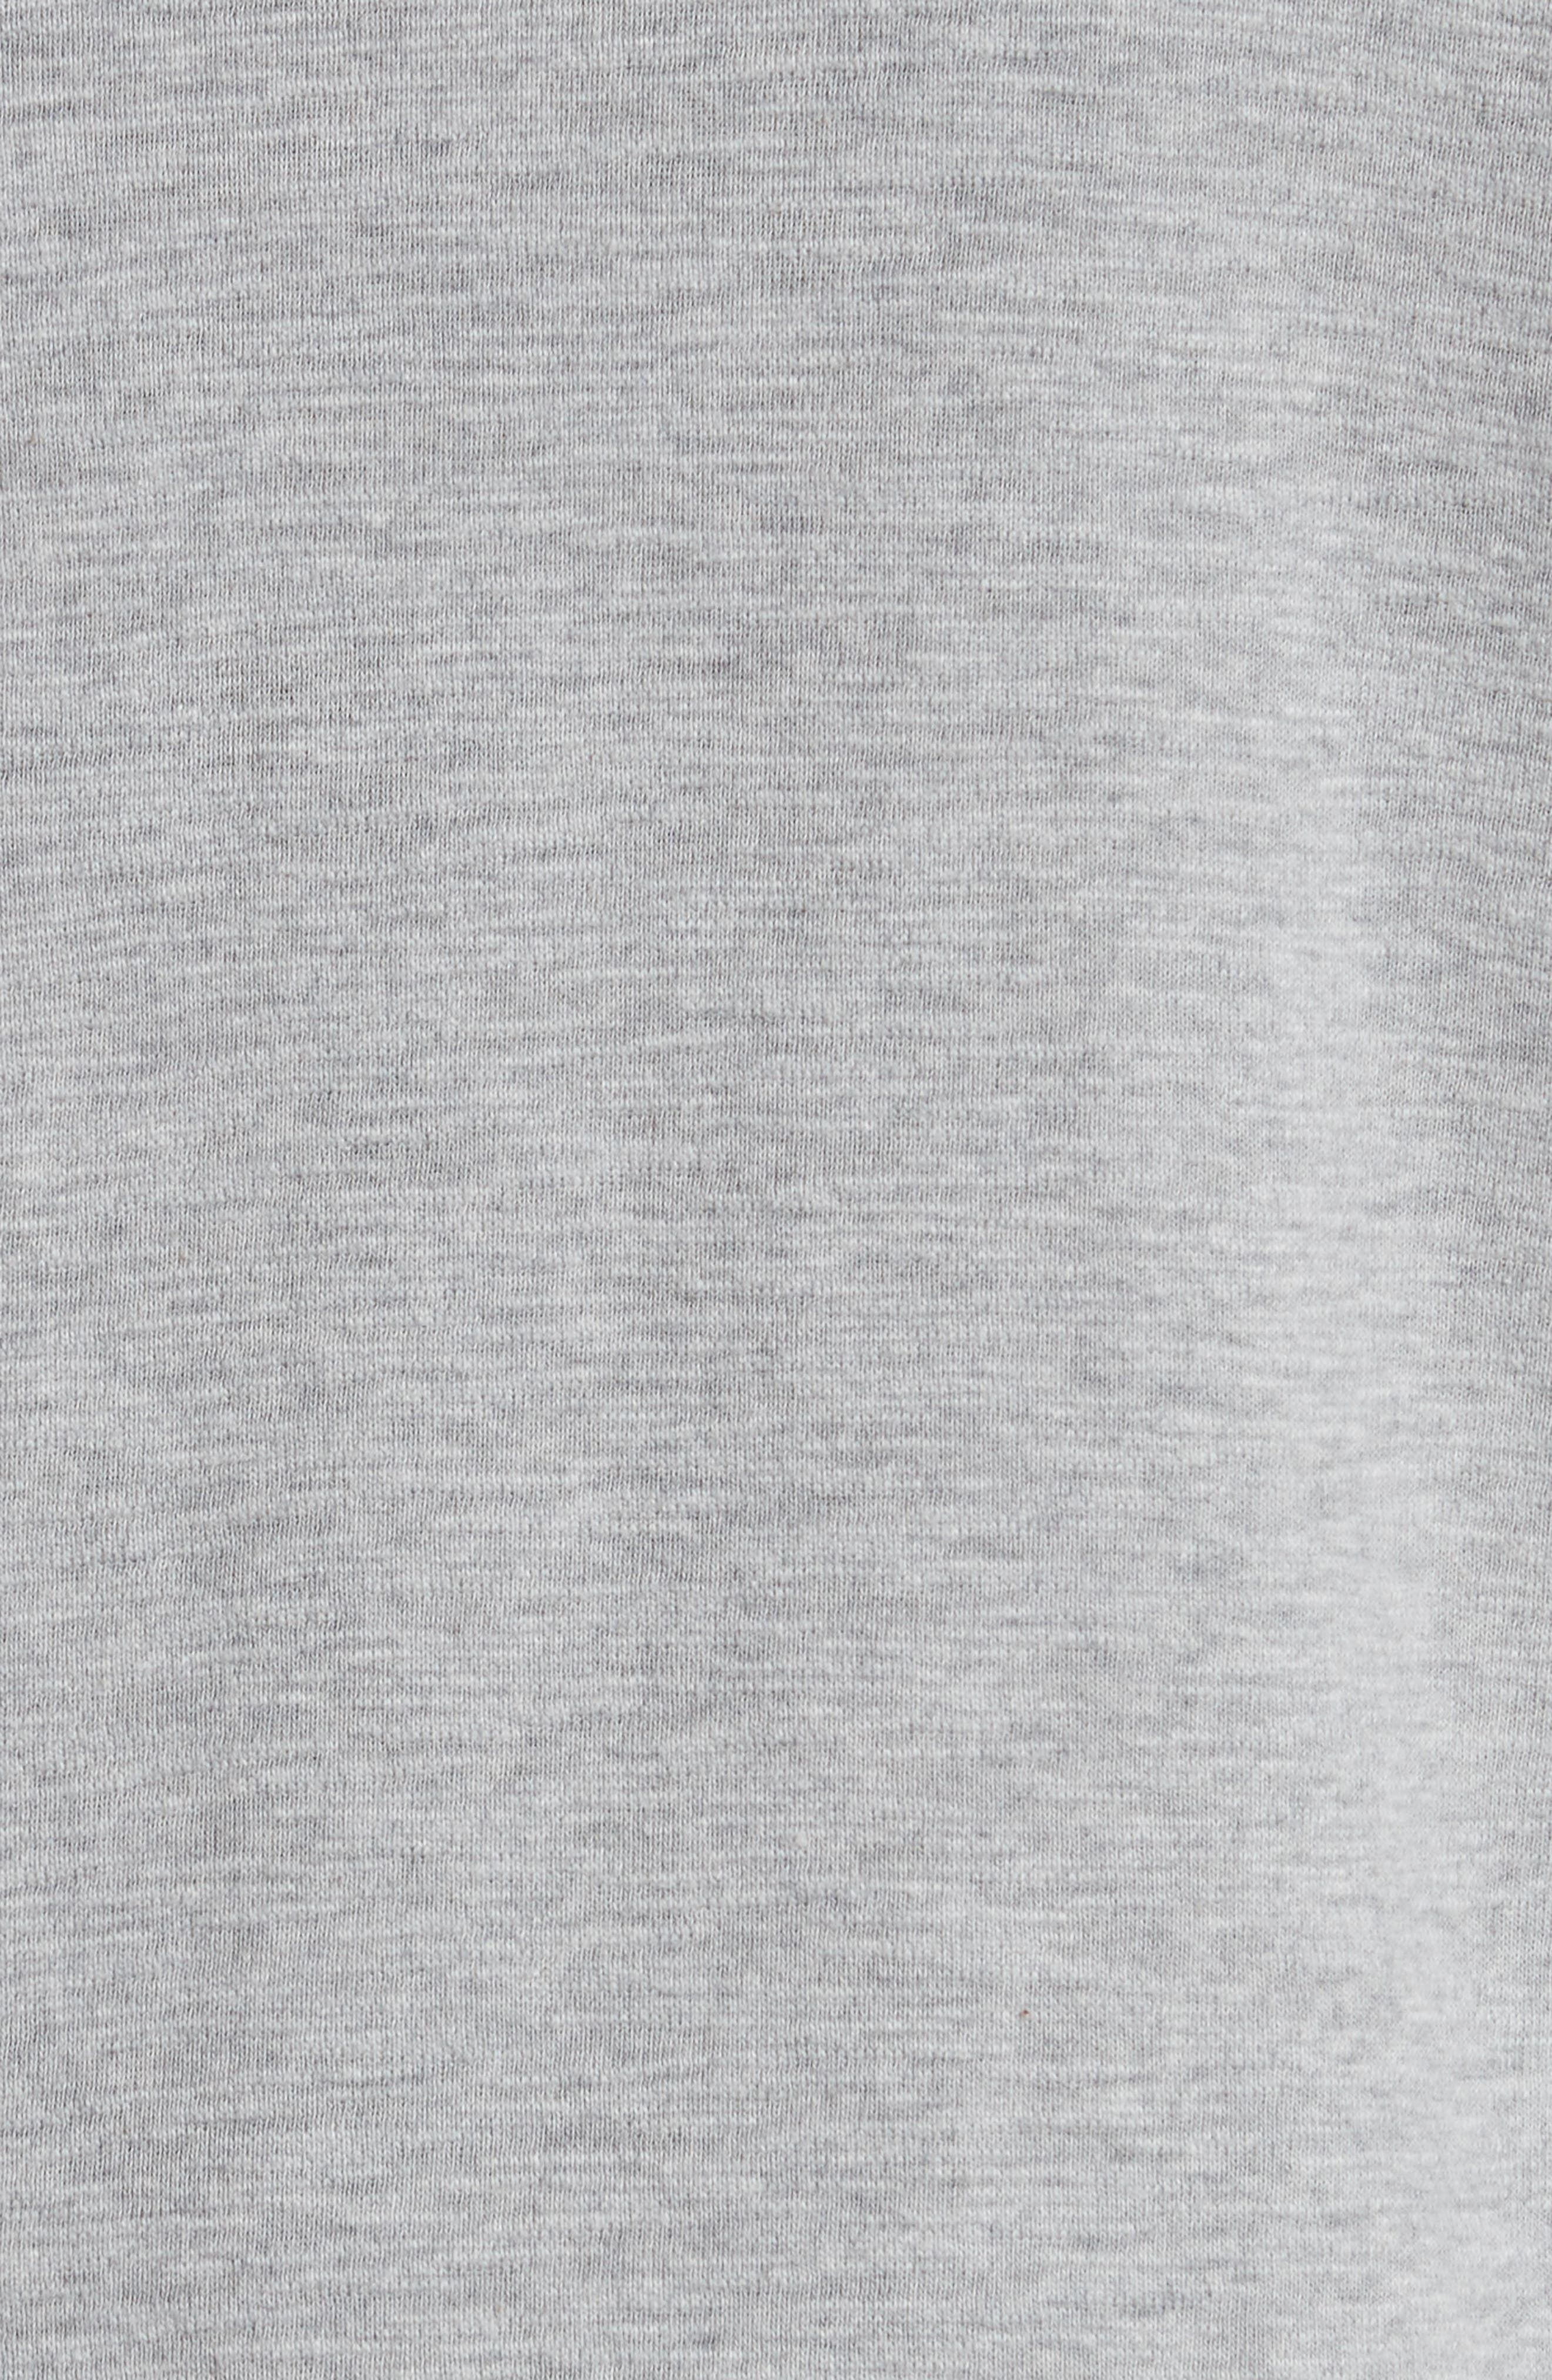 Slub Crewneck Sweater,                             Alternate thumbnail 5, color,                             HEATHER GREY